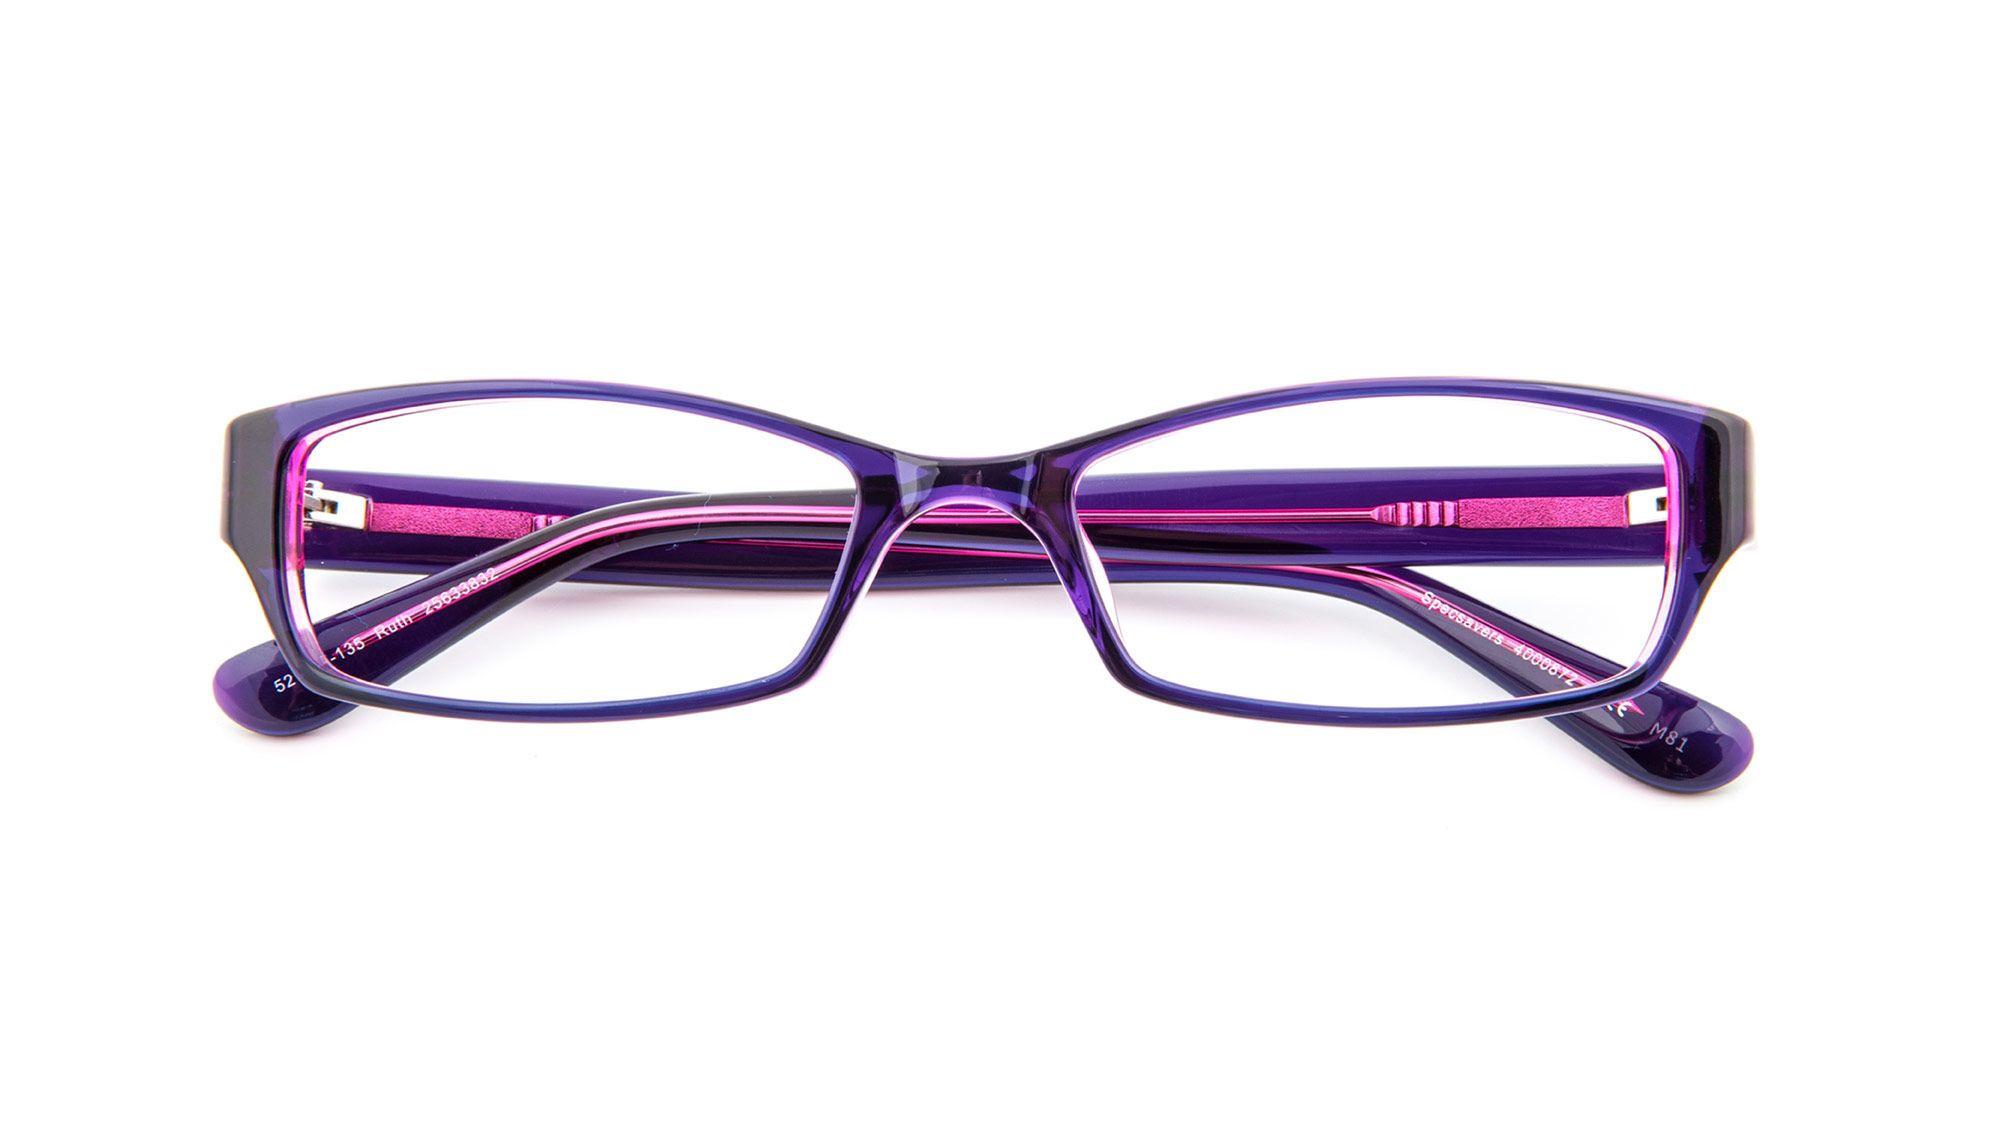 4a97383f96b Specsavers glasses - RUTH